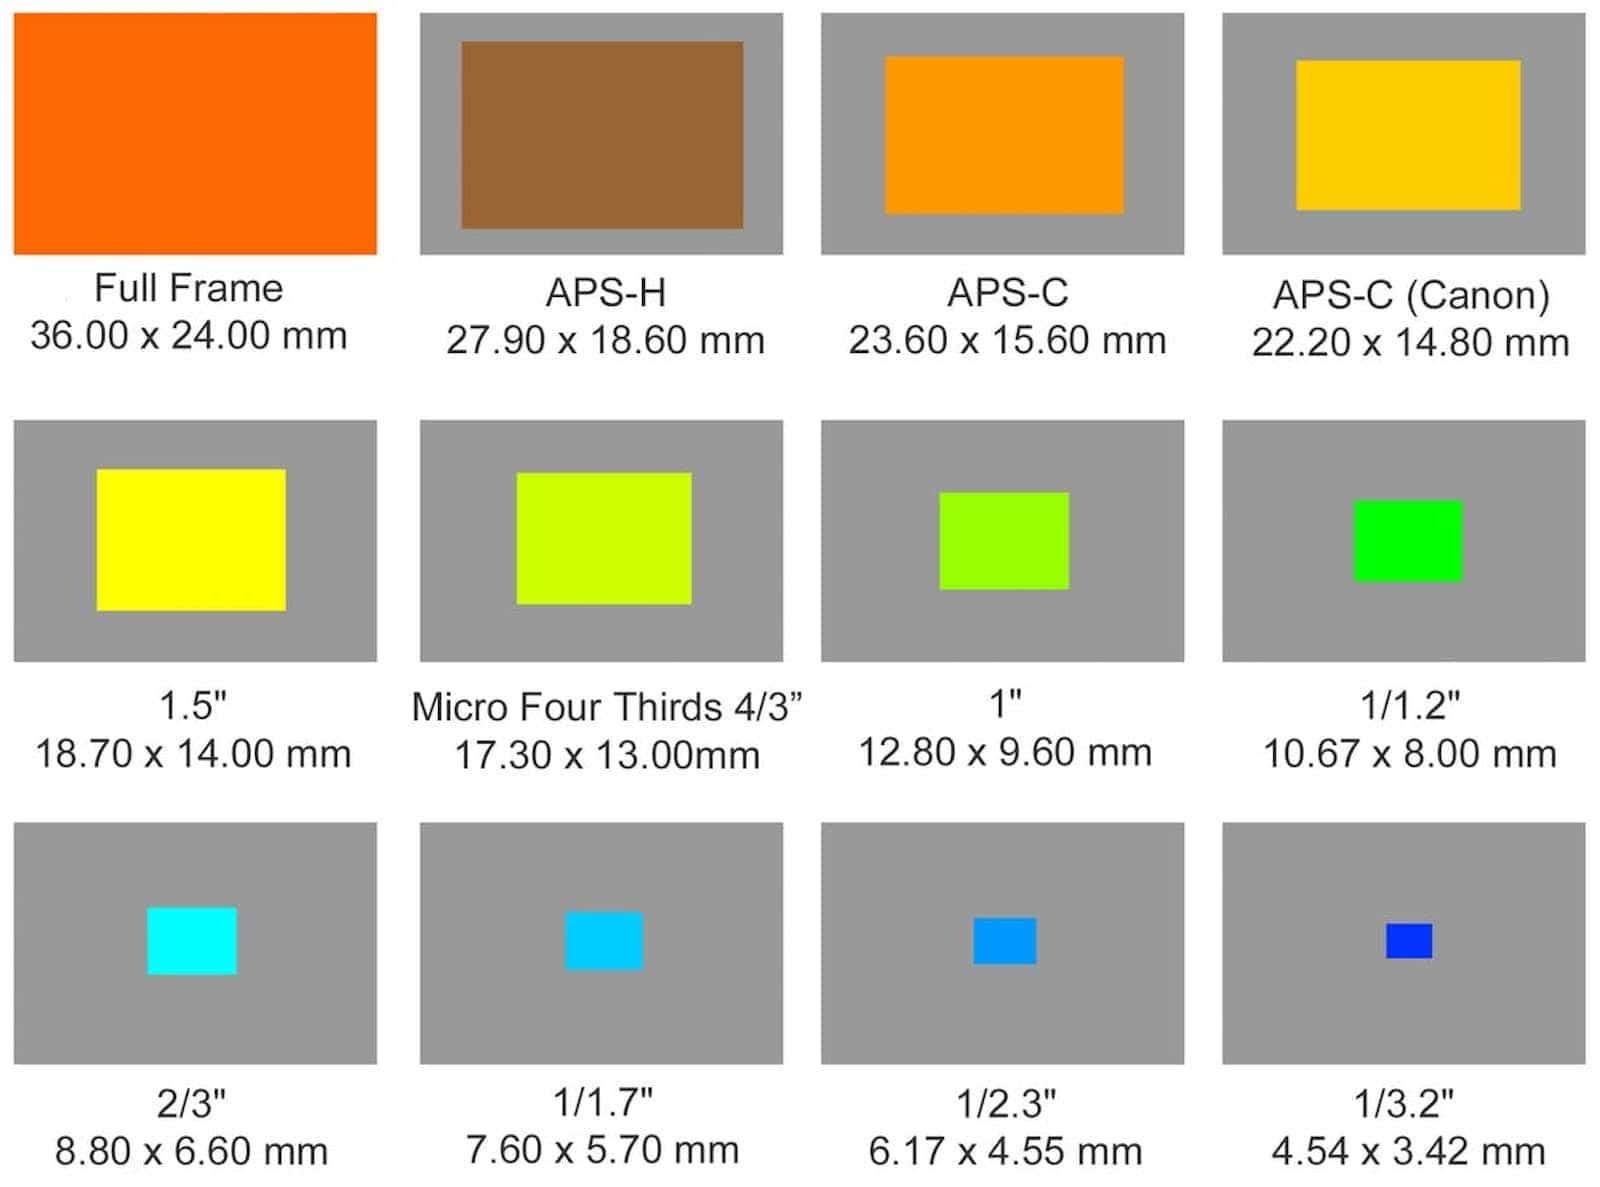 Camera Sensor Size Explained - Sensor Size Chart - Image